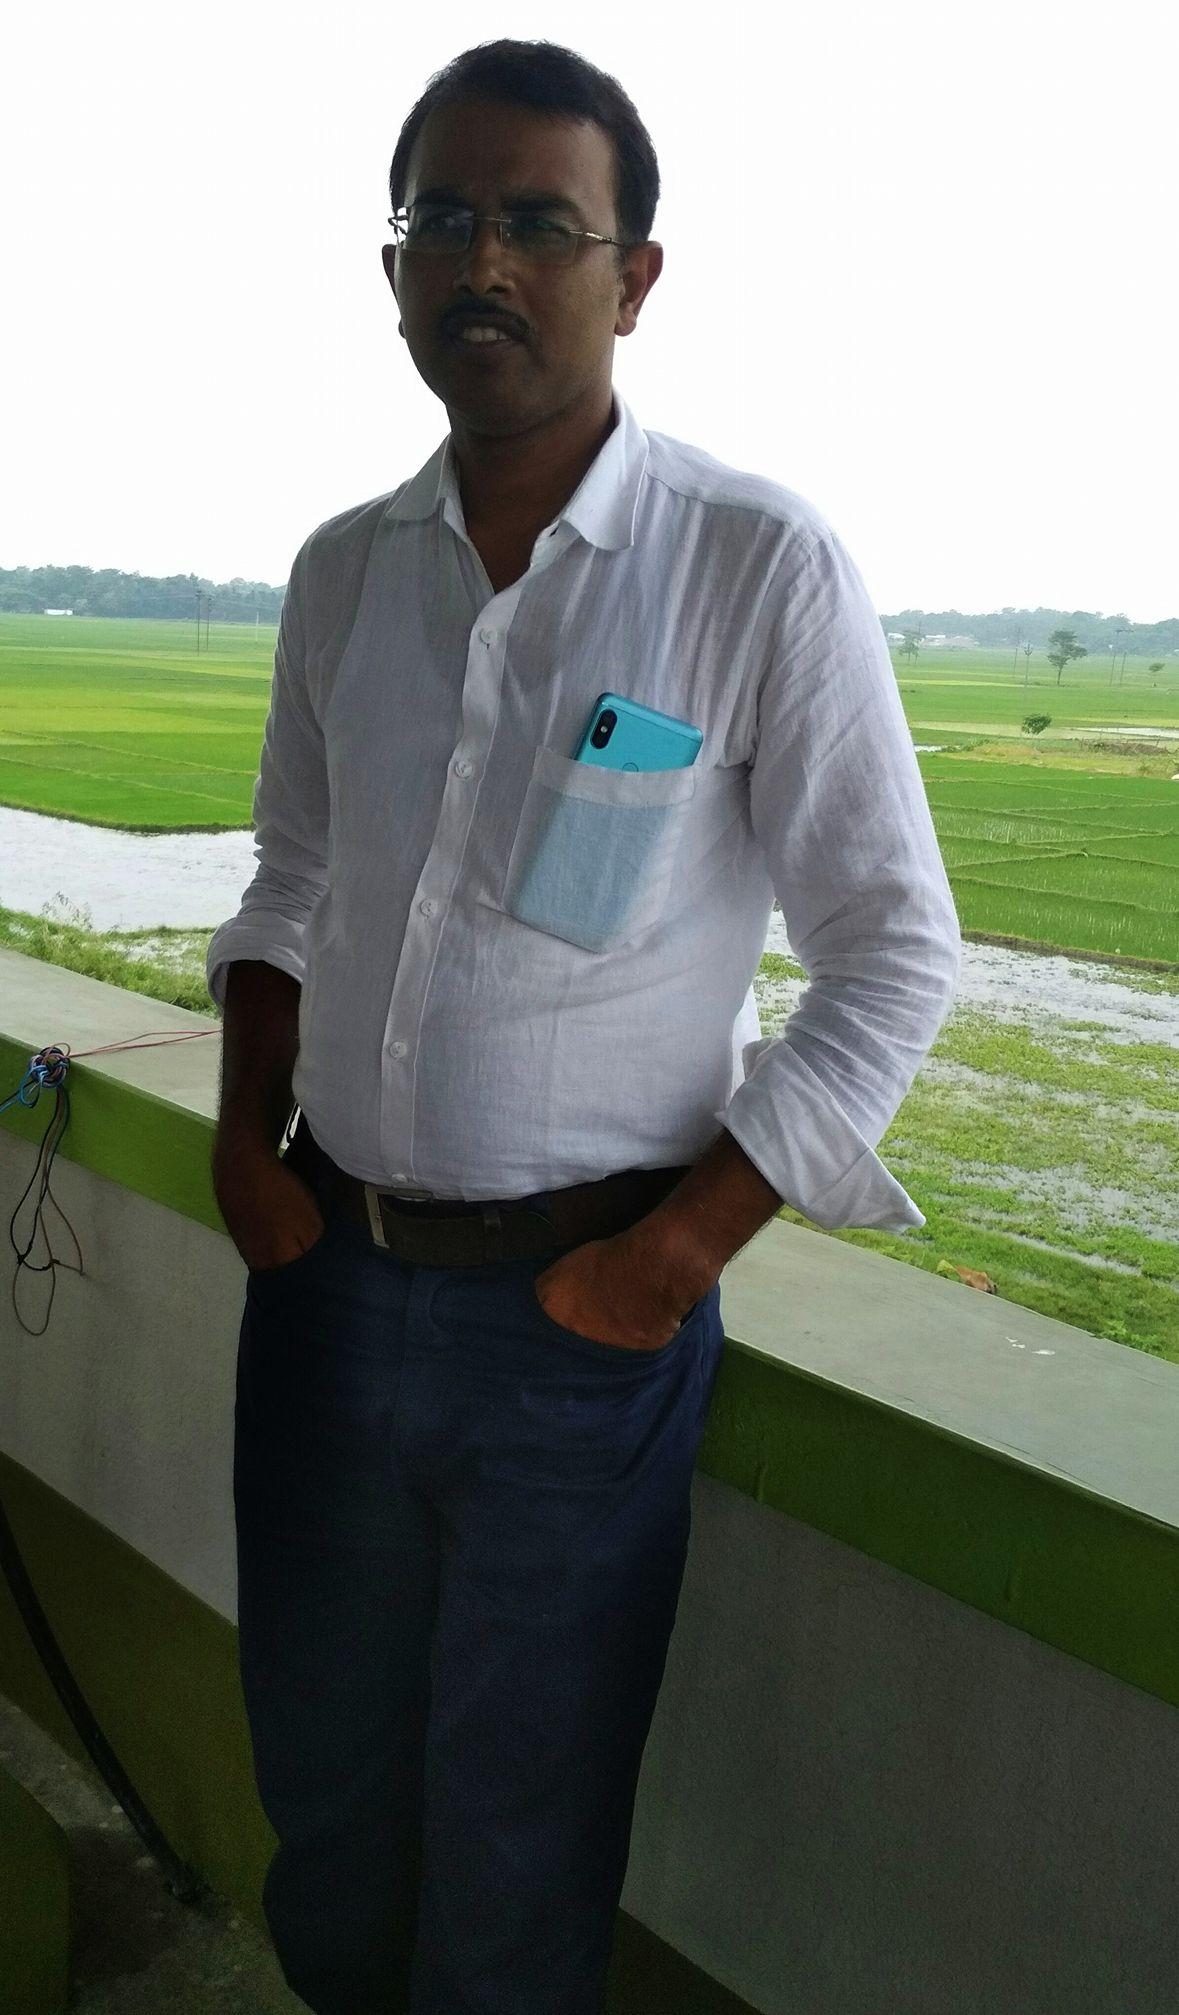 Sri AMLAN DATTA